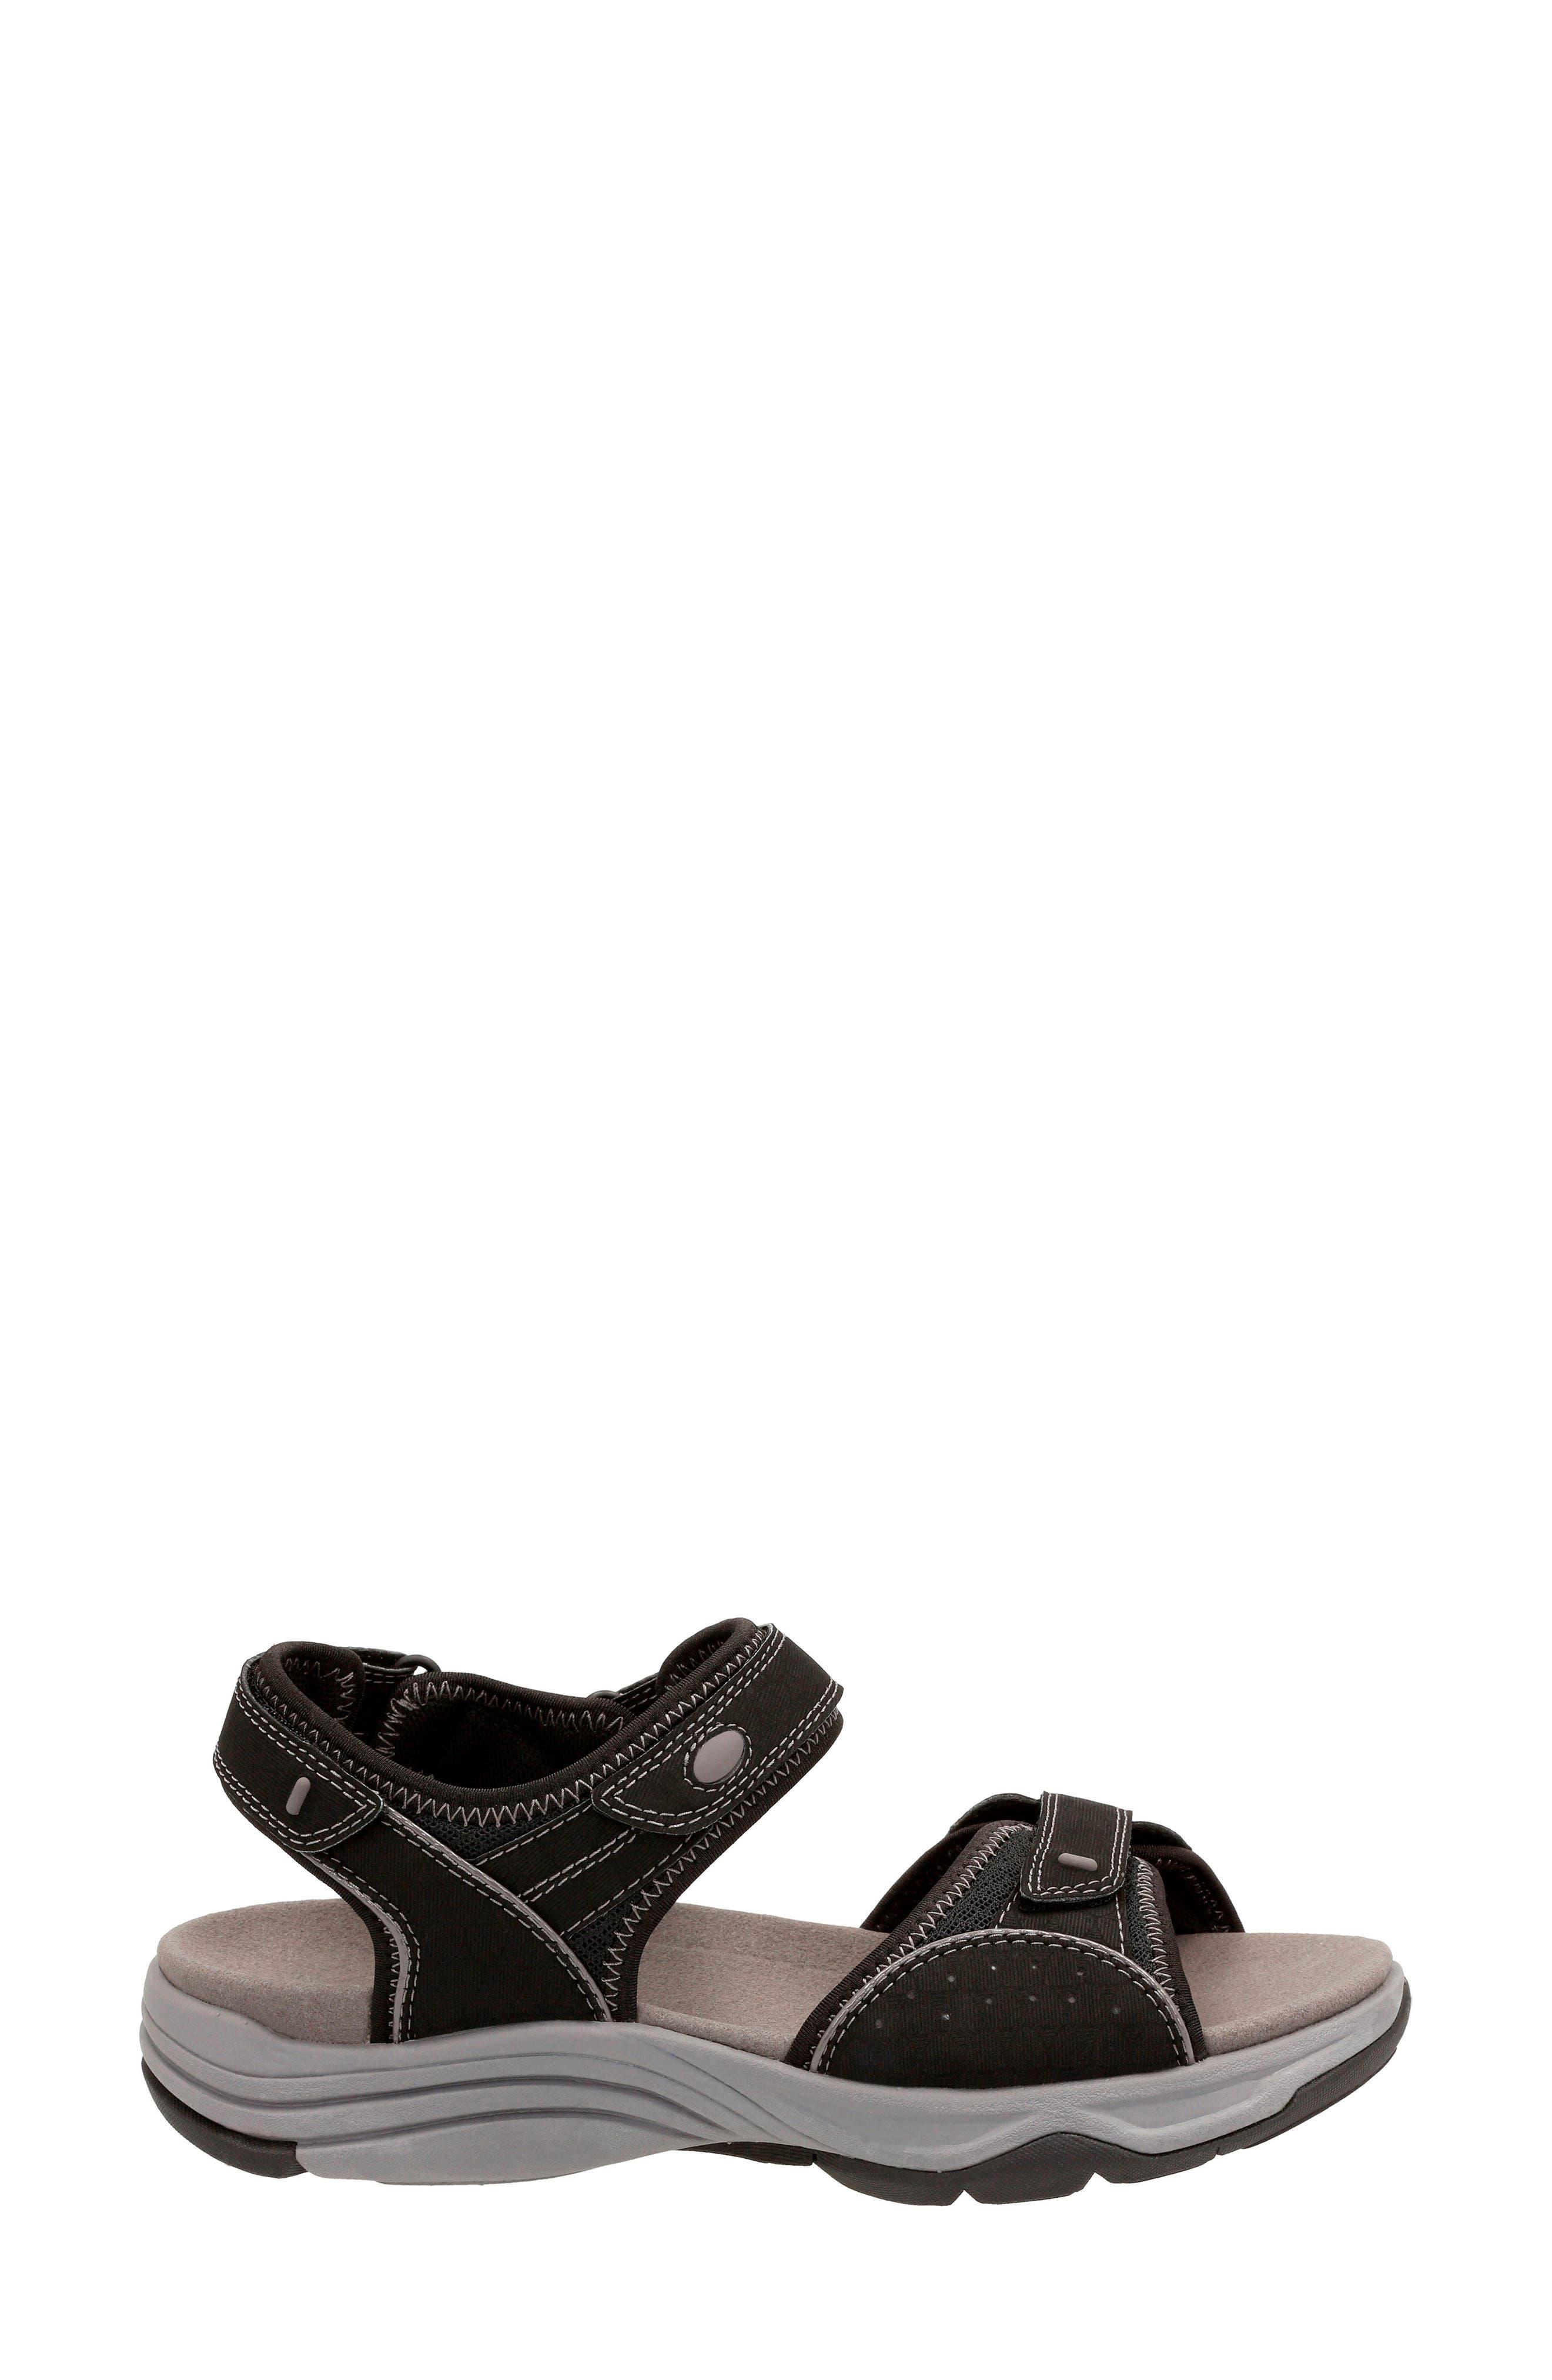 Wave Grip Sandal,                             Alternate thumbnail 3, color,                             BLACK FABRIC